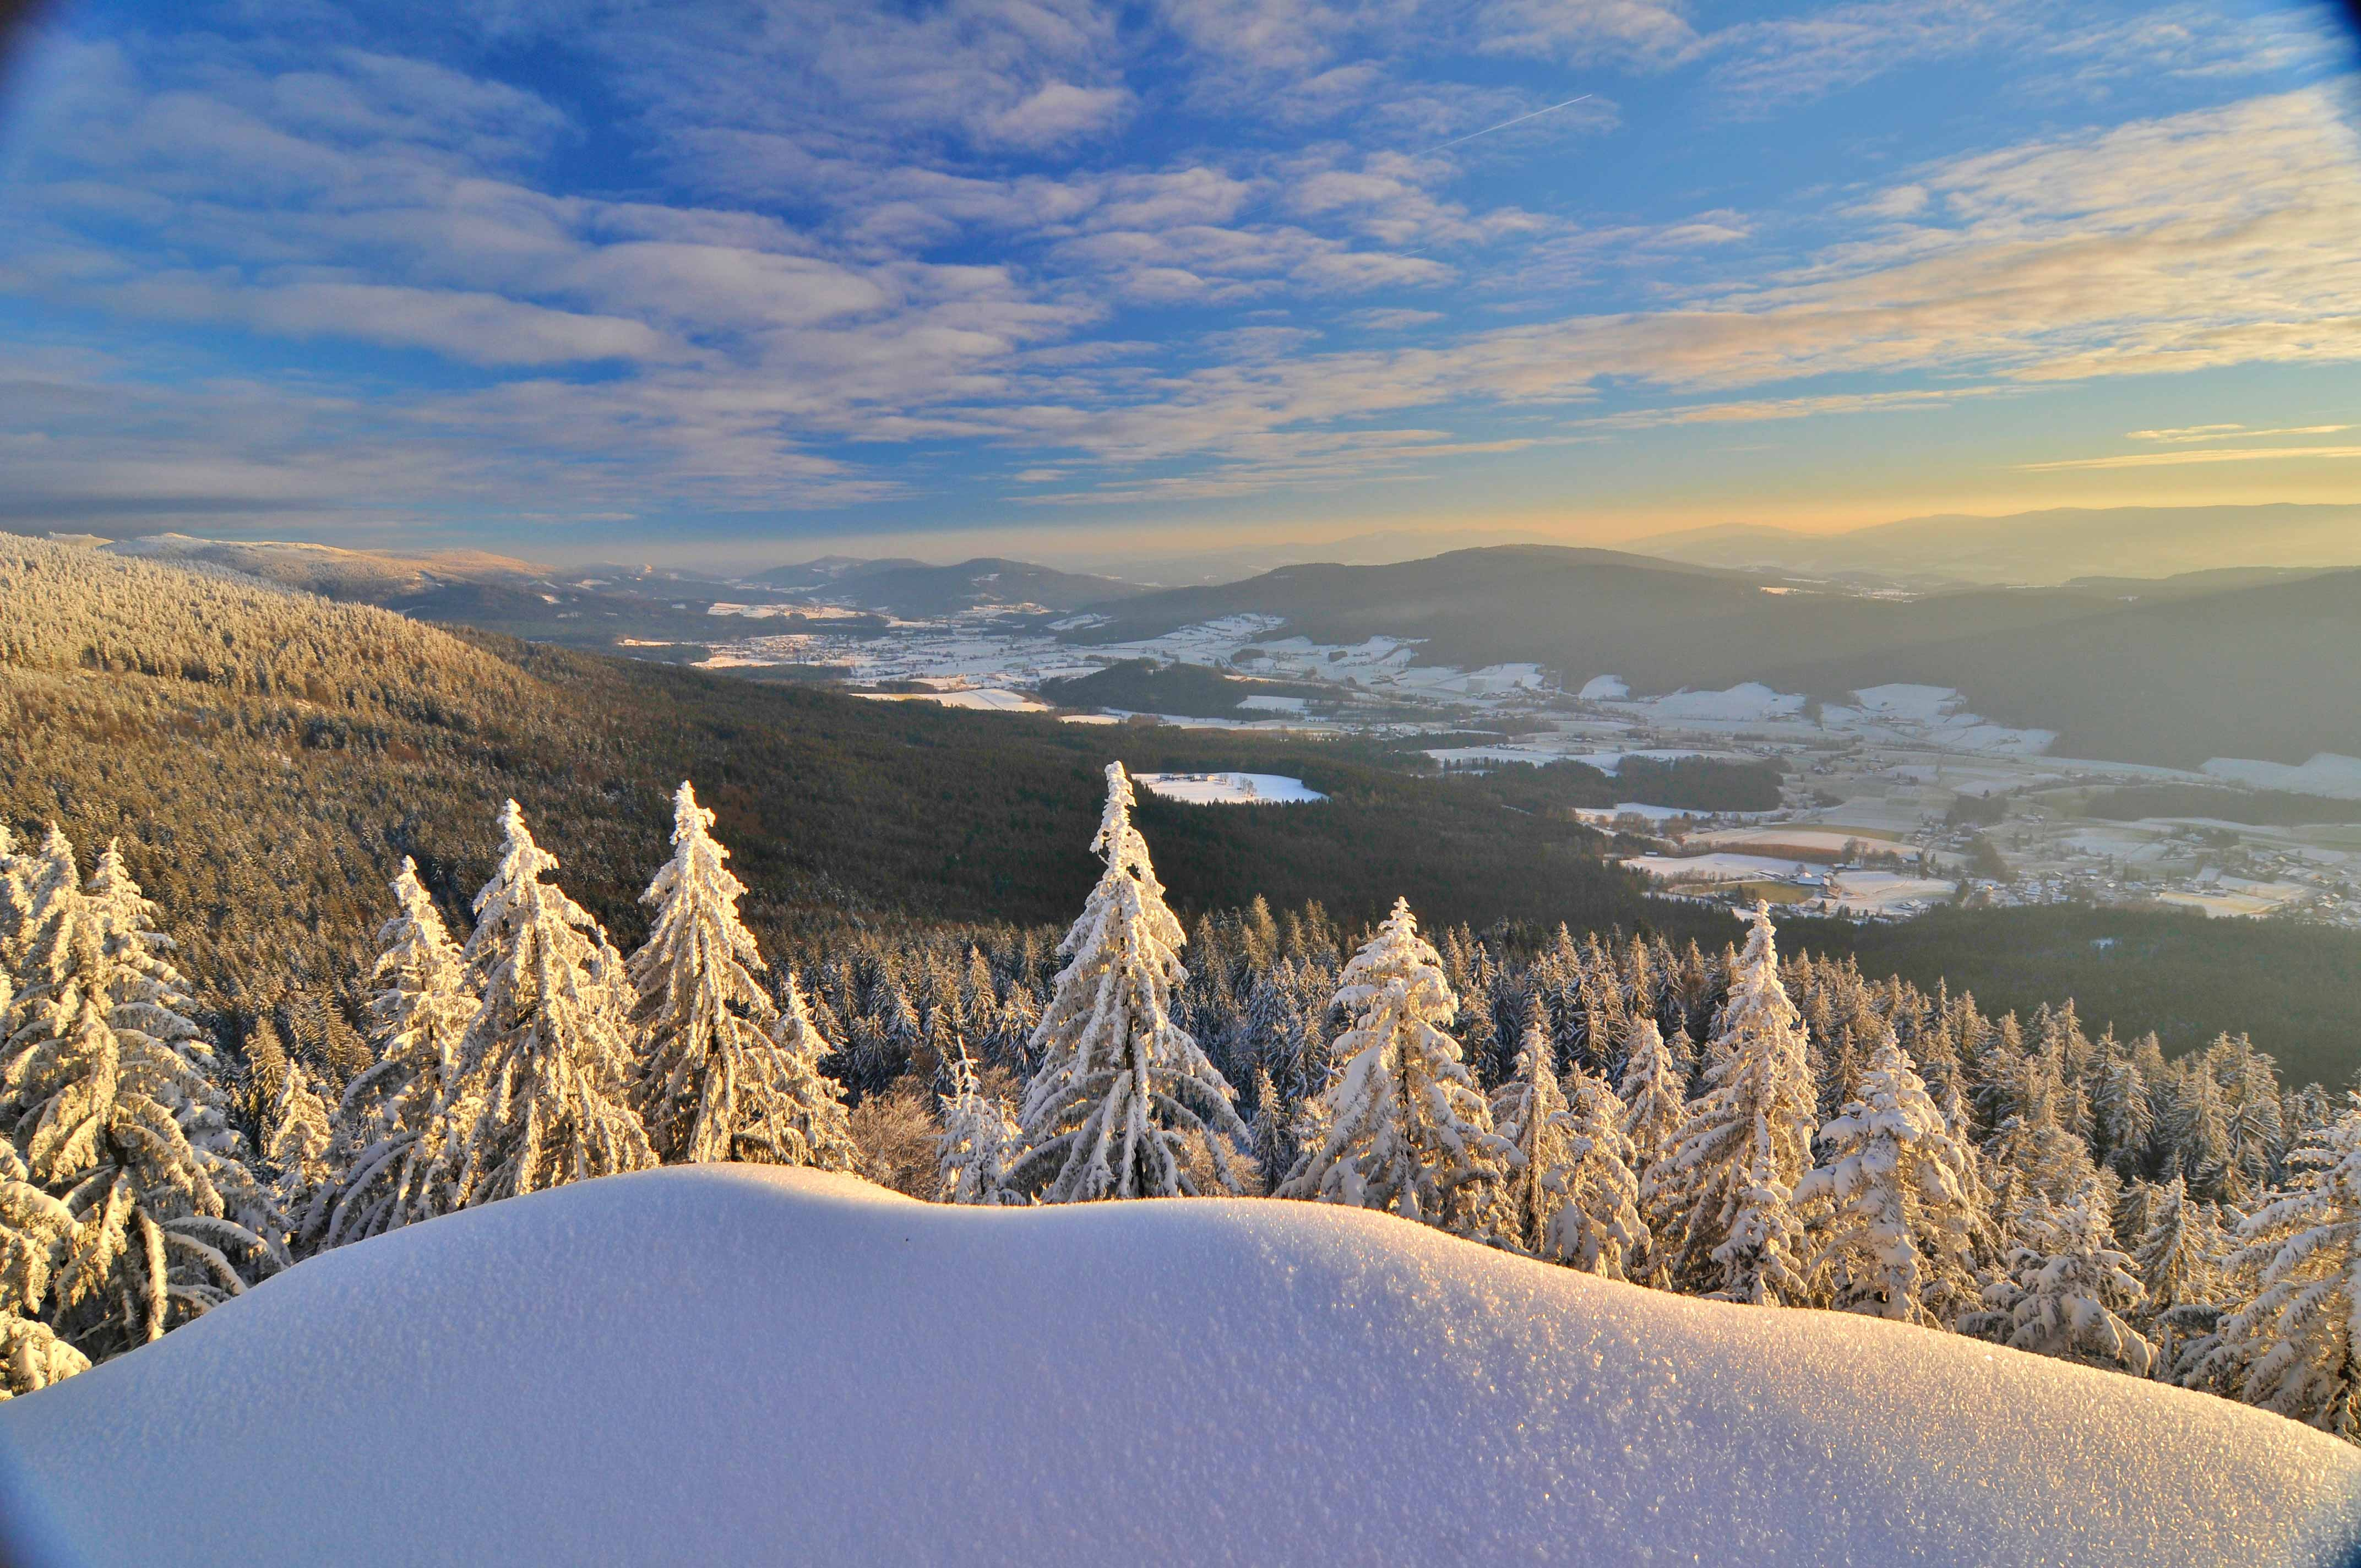 Kaitersberg-Winter-Foto-Jilek-(1)